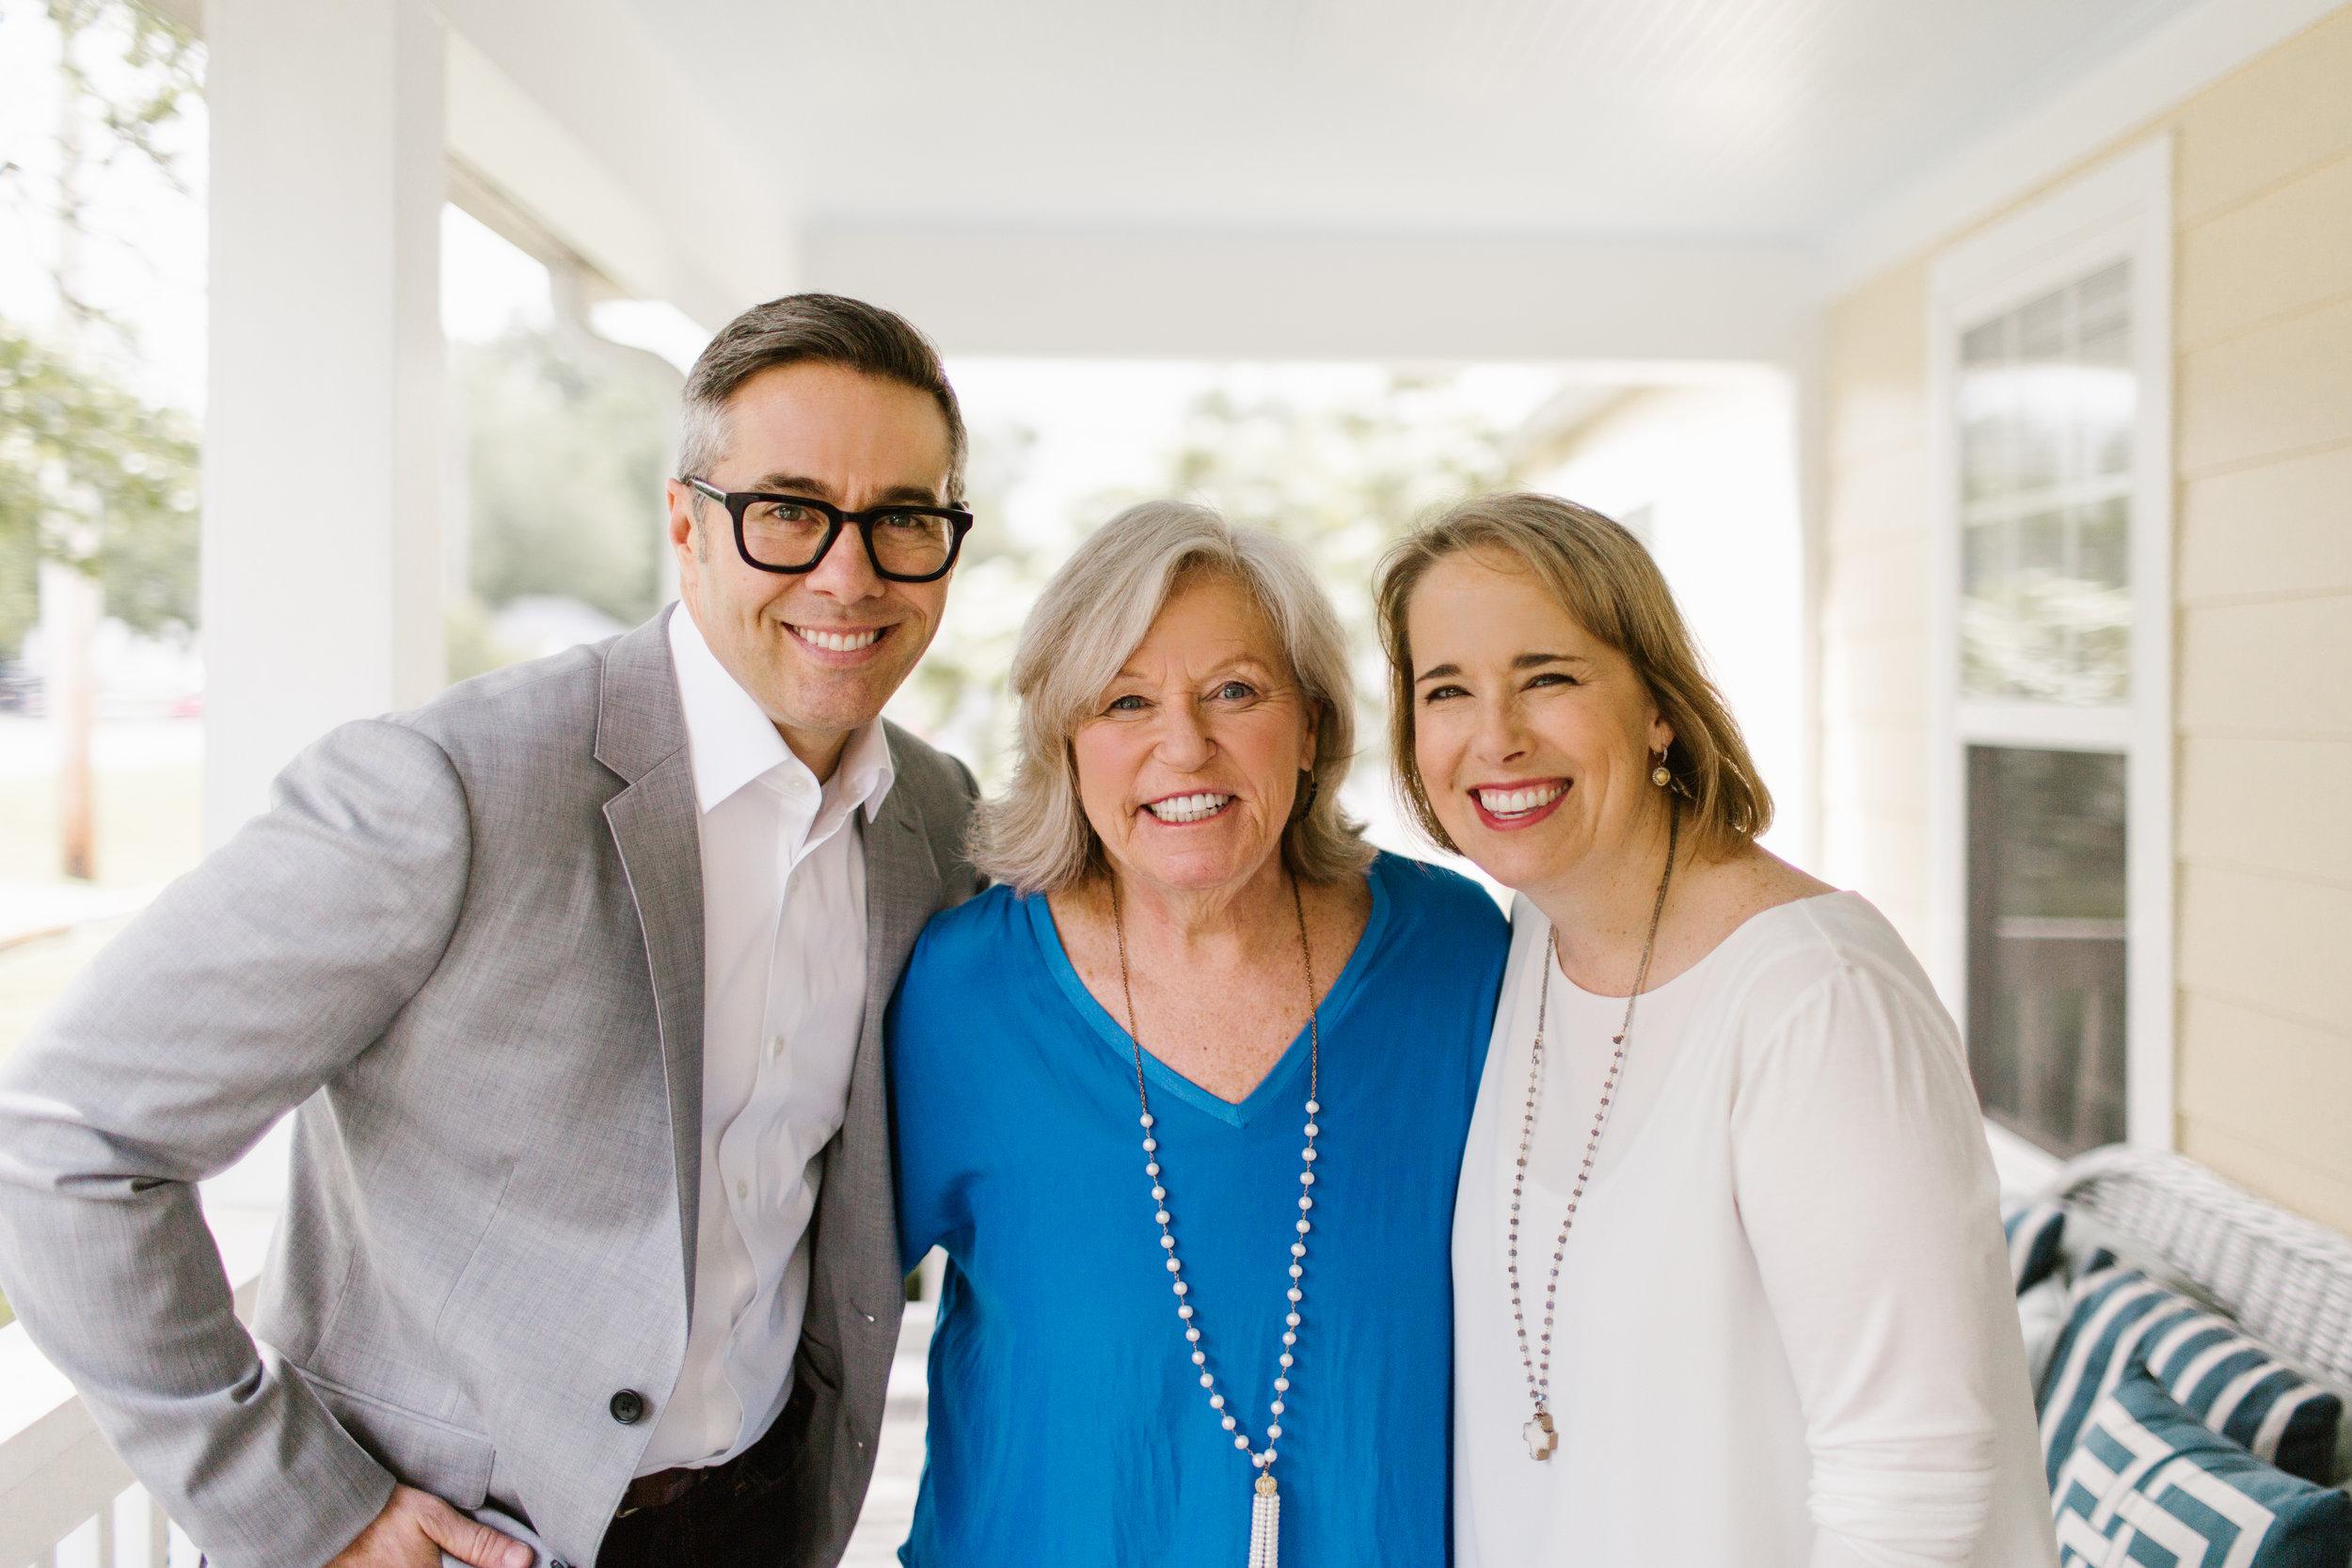 David, Melissa, & Sissy Horizontal Press Photo